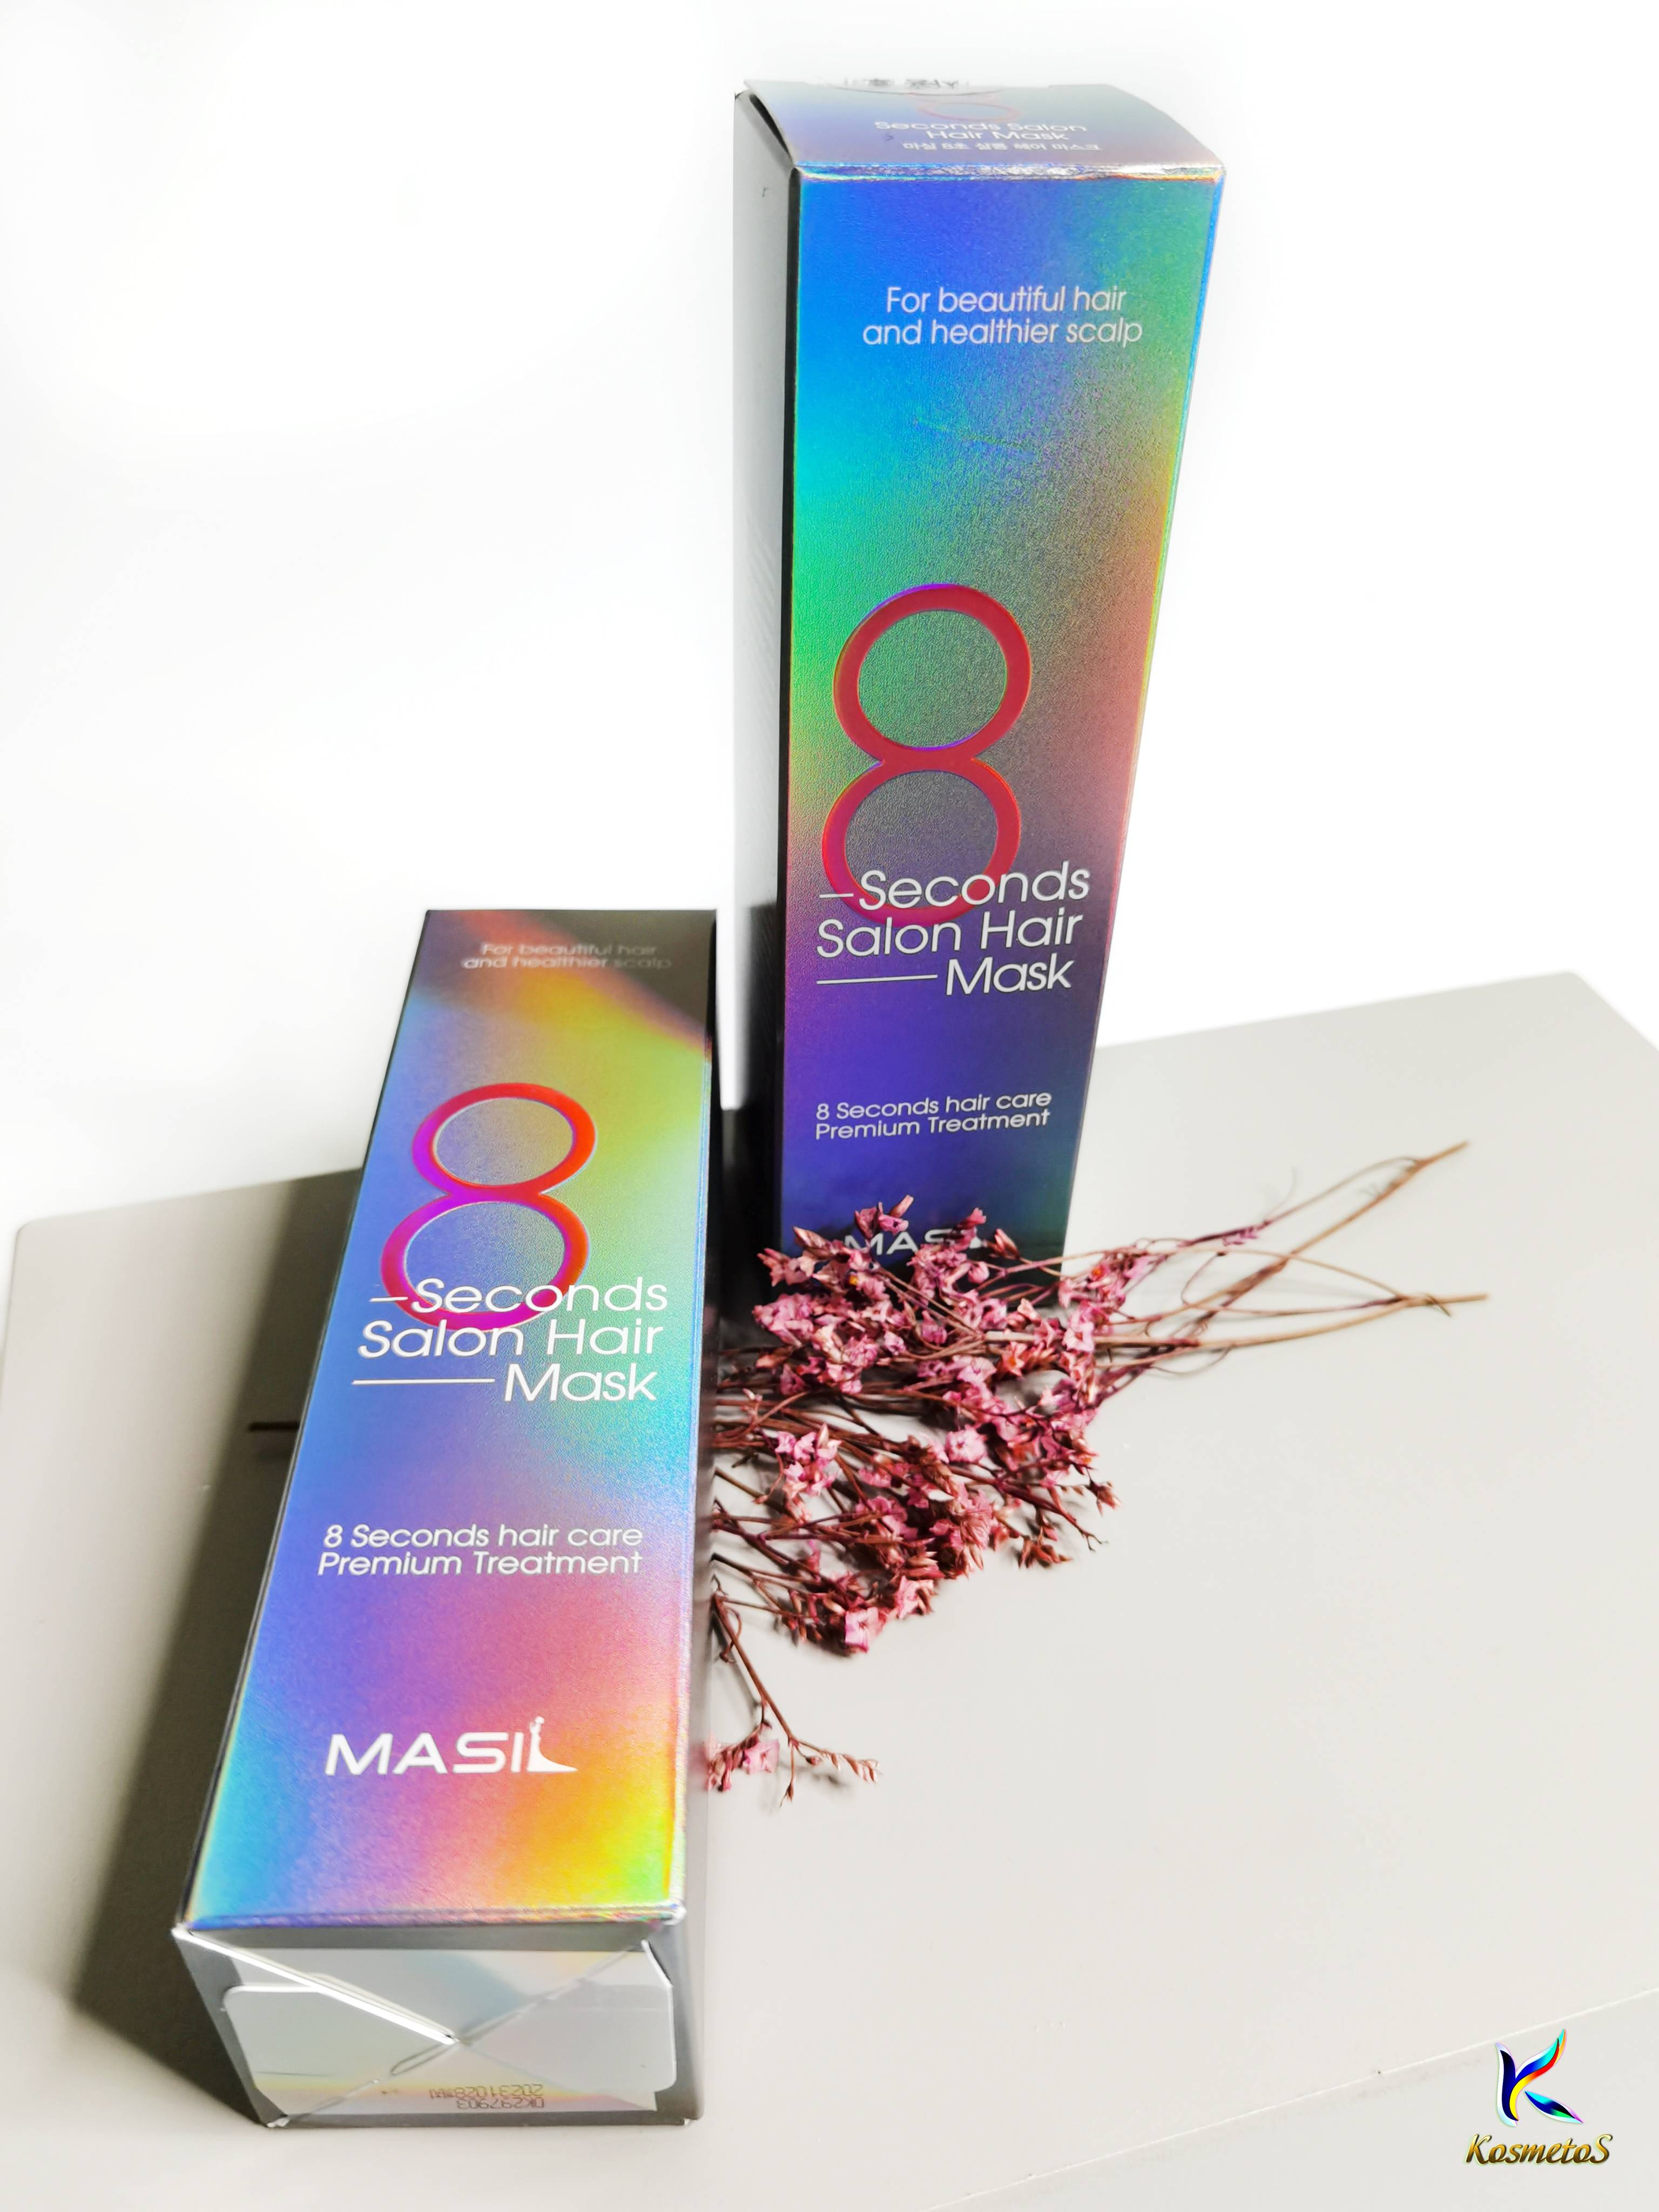 Masil 8 Seconds Salon Hair Mask 200ml